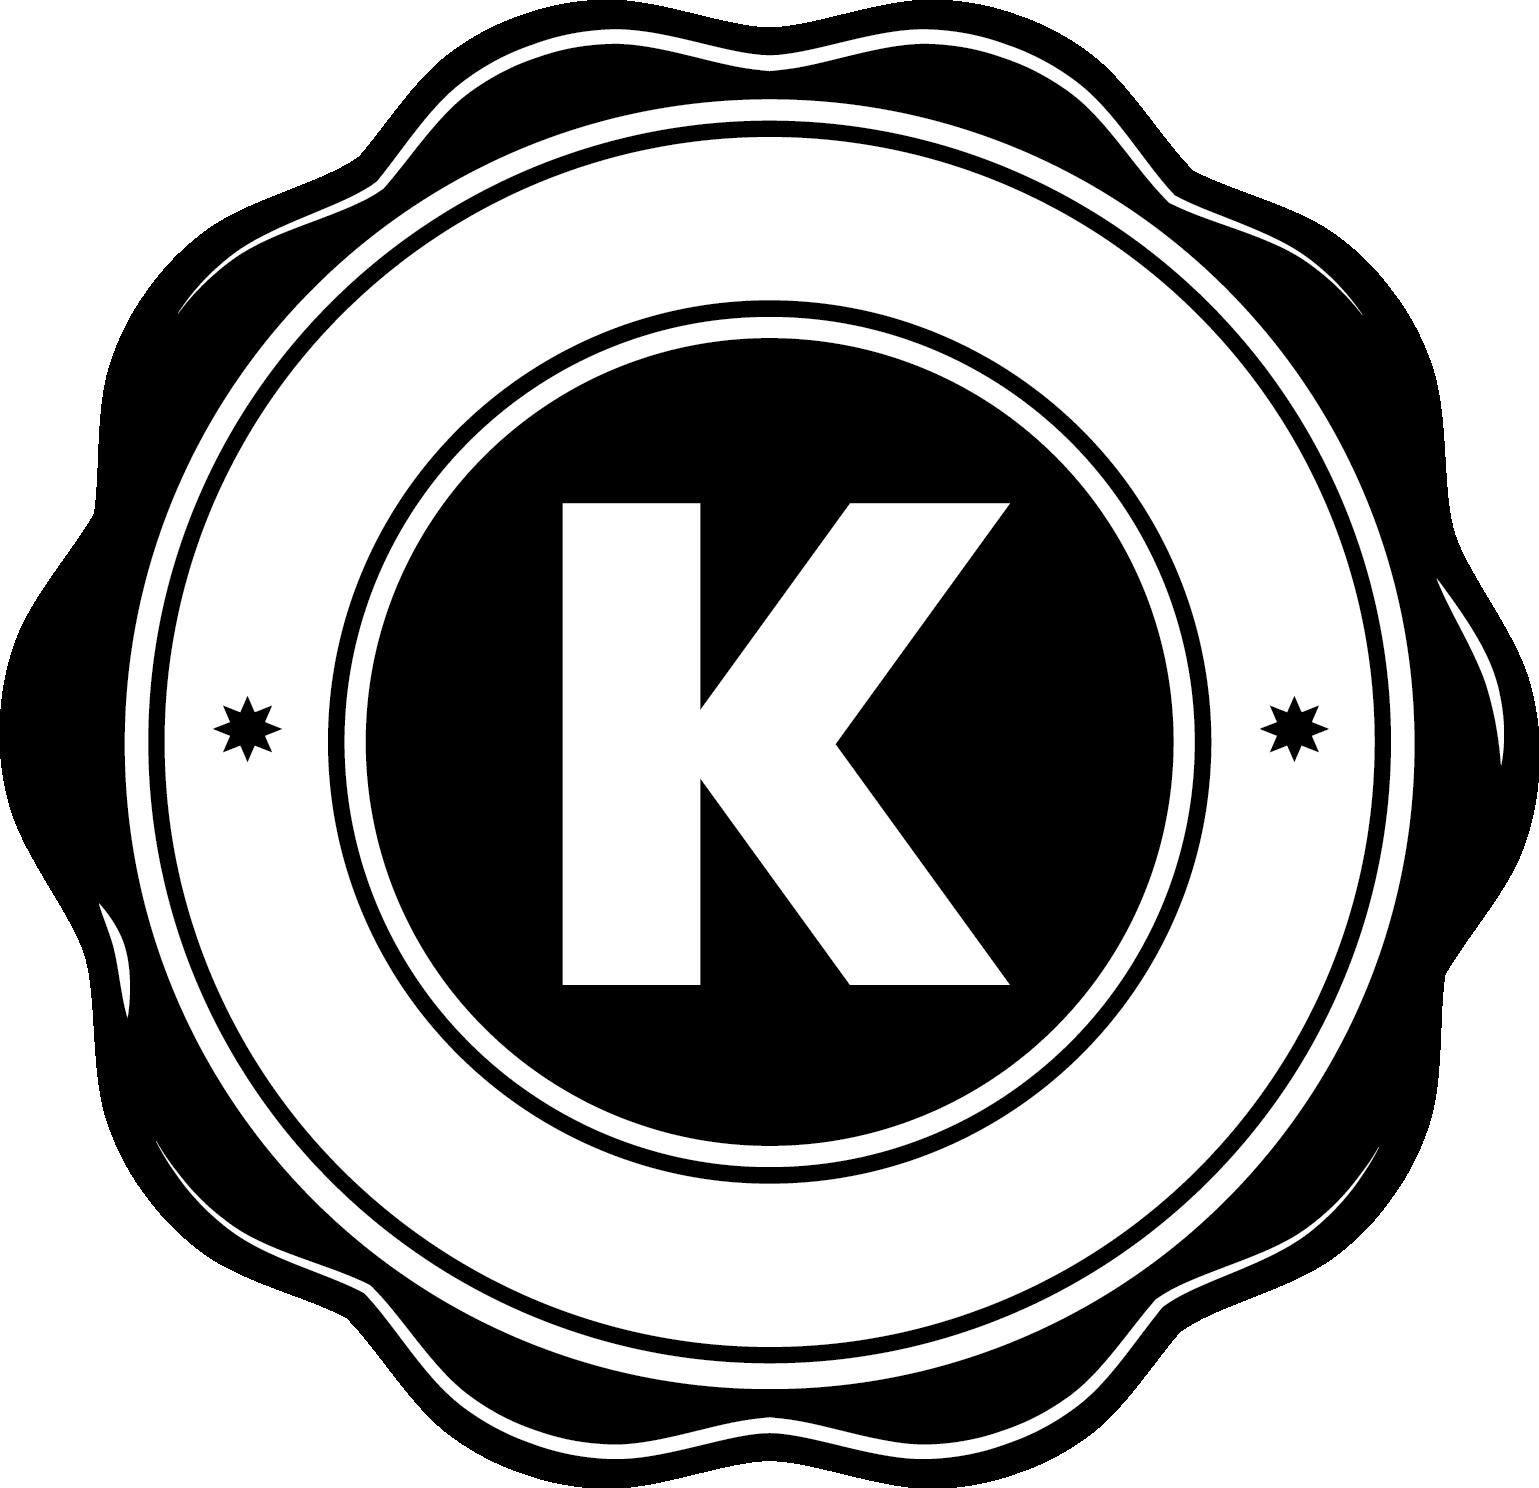 kosher seal certification certified icon wikipedia sdg vector wikimedia line halal sellers vs building menu greendropship